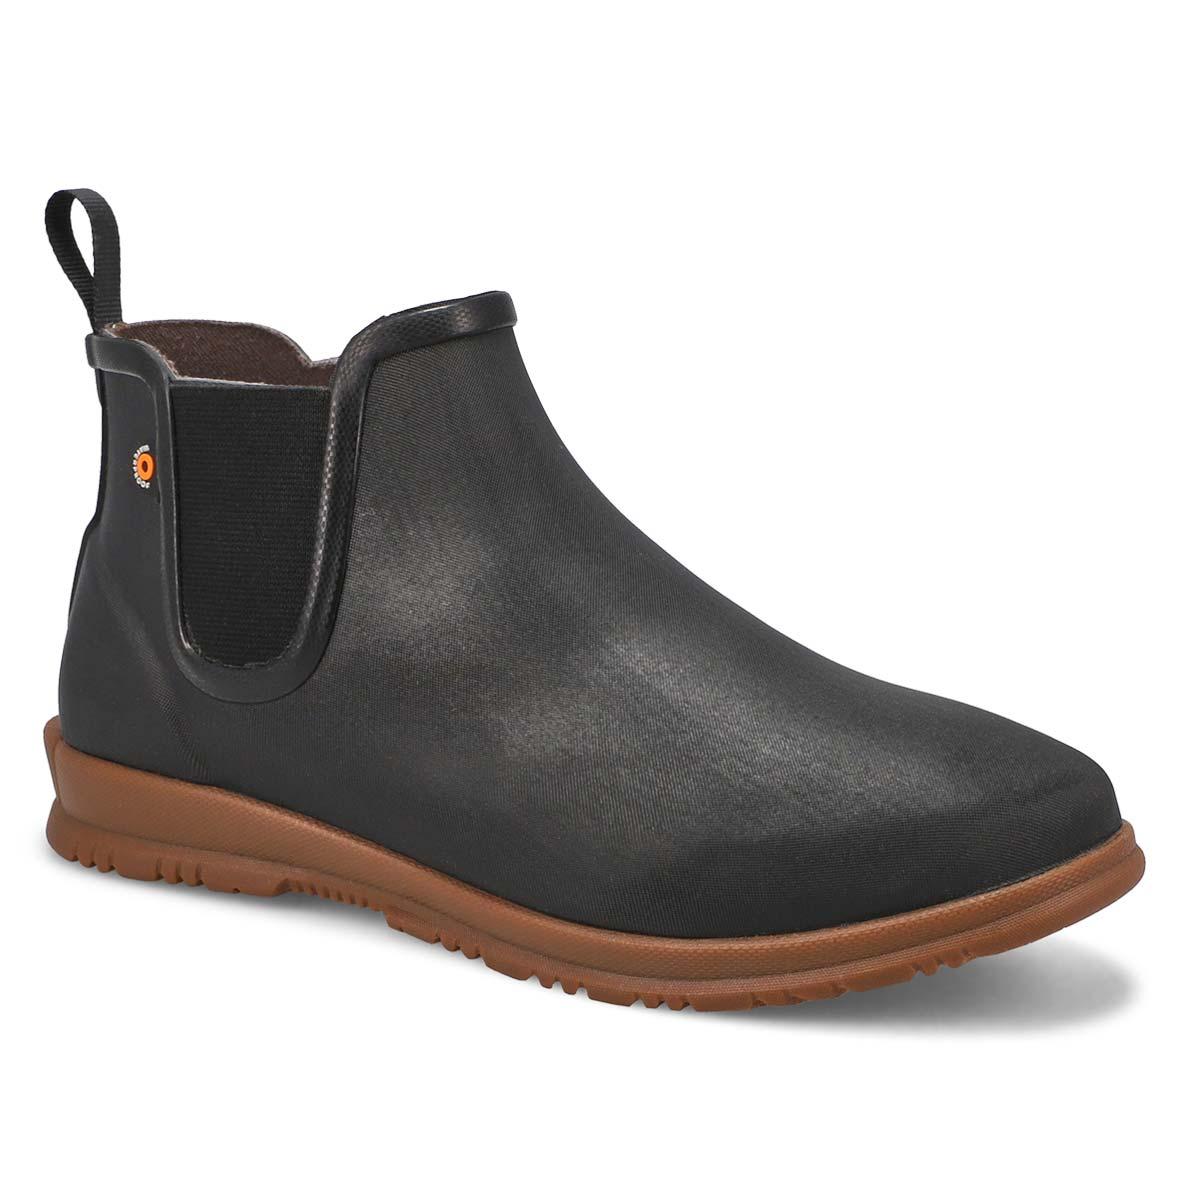 Lds Sweetpea black waterproof boot